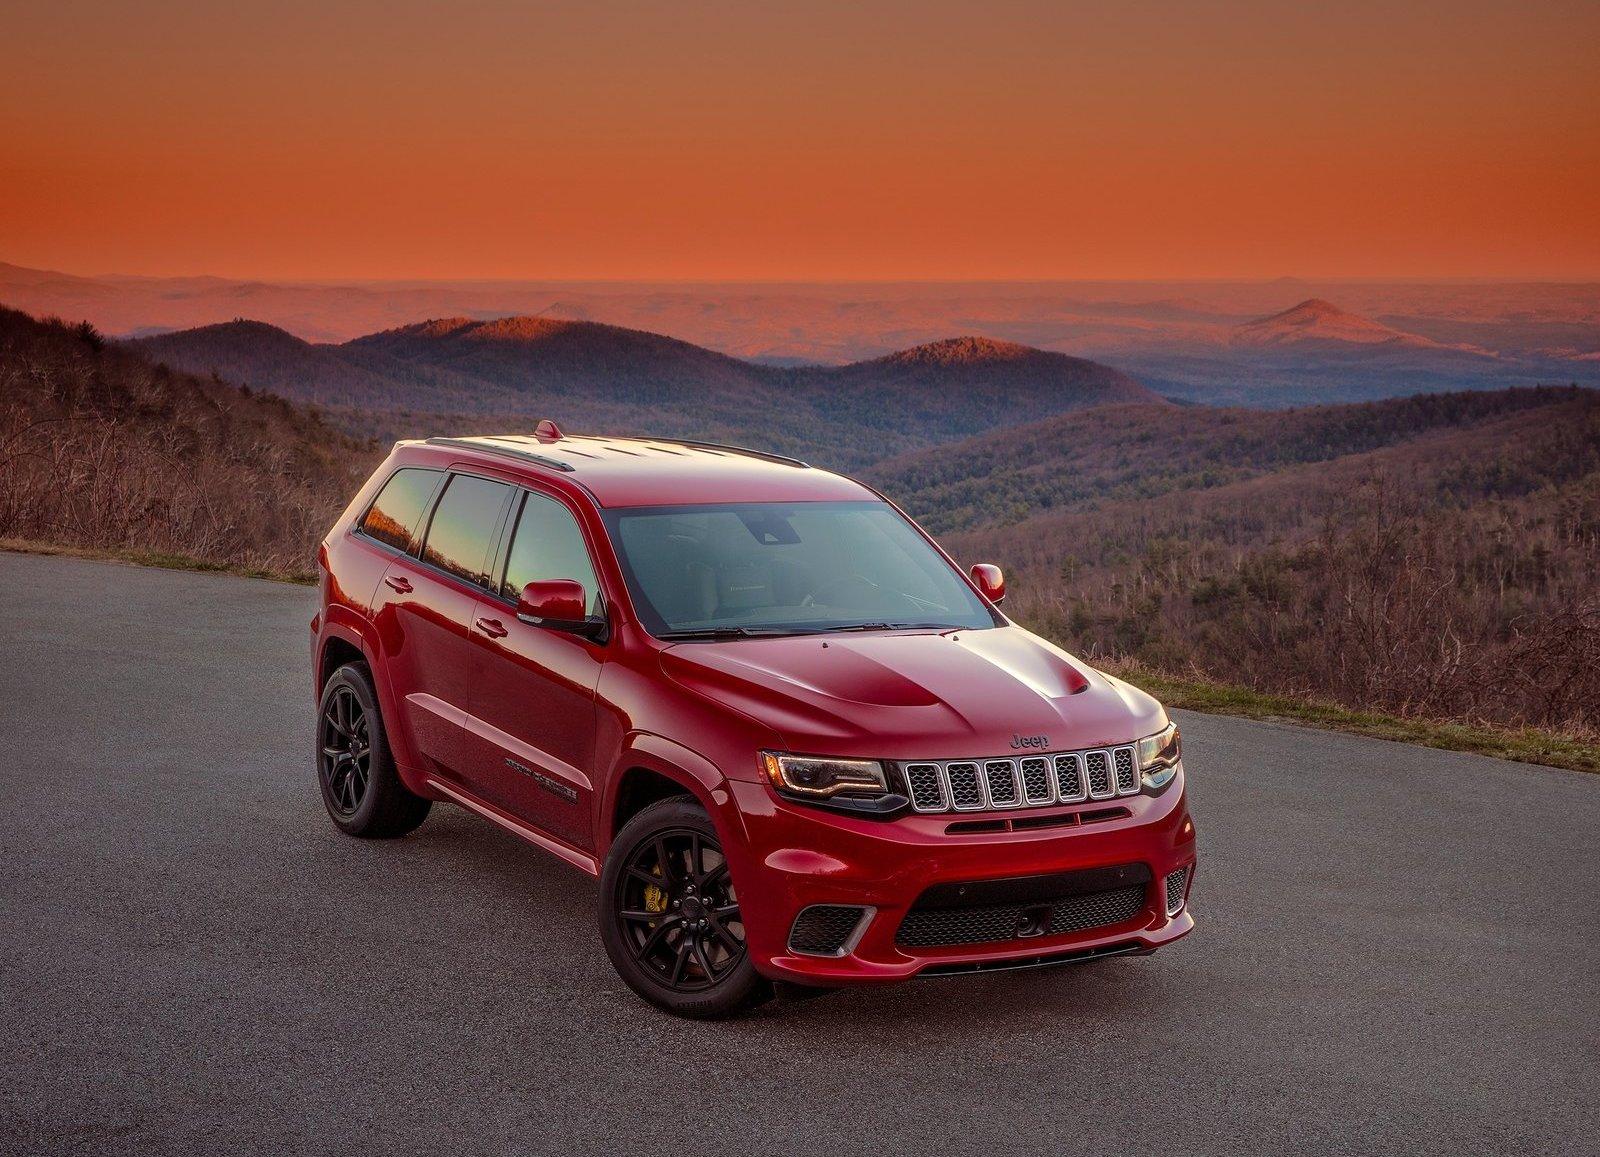 2018 Jeep Grand Cherokee SRT TrackHawk